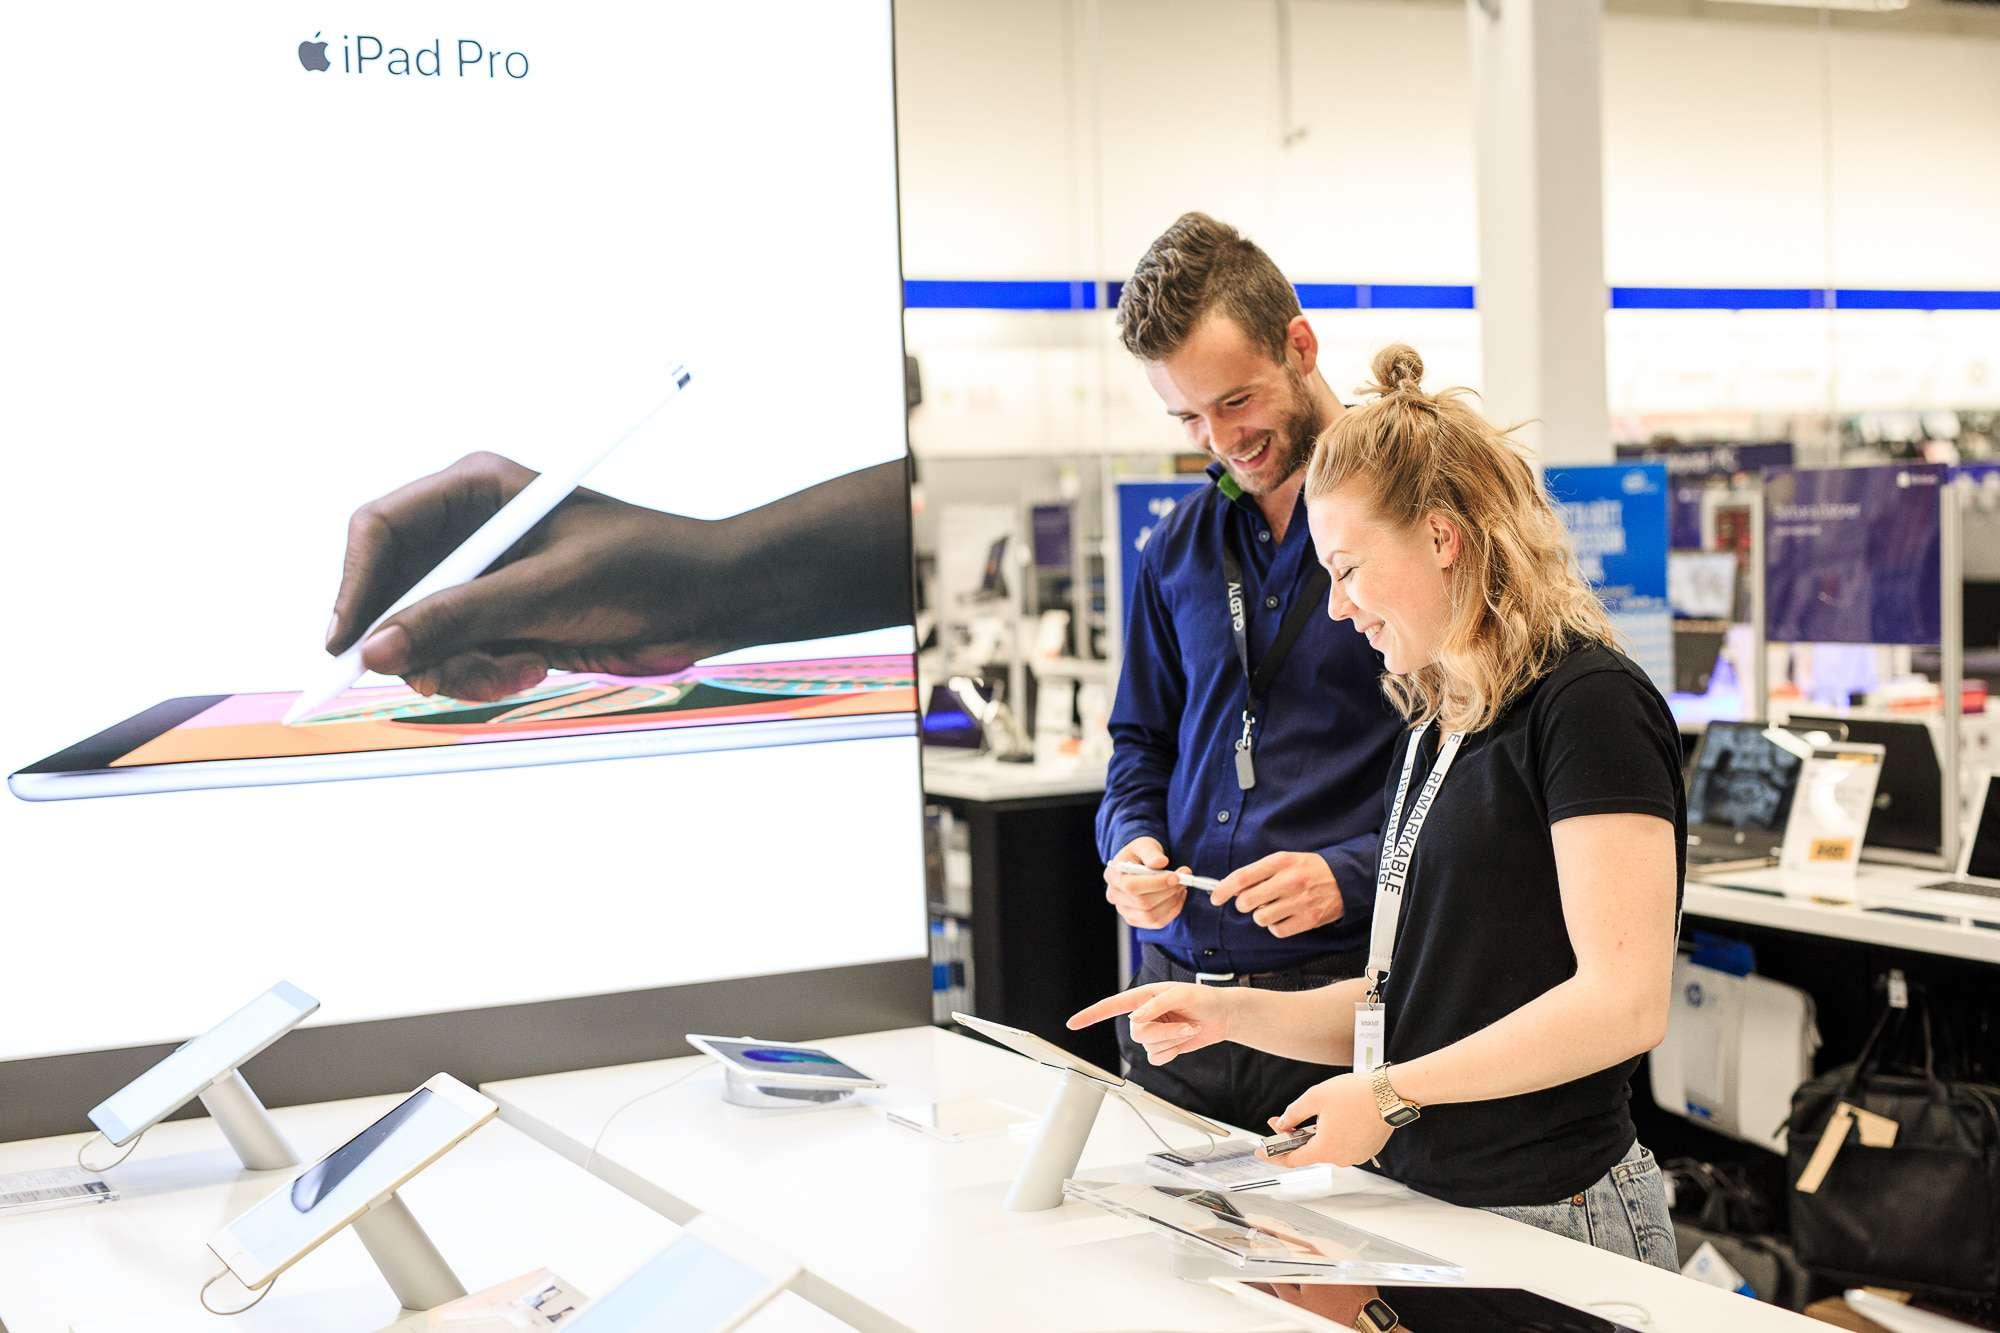 Apple Brand Advocate [Hemsidebilder]